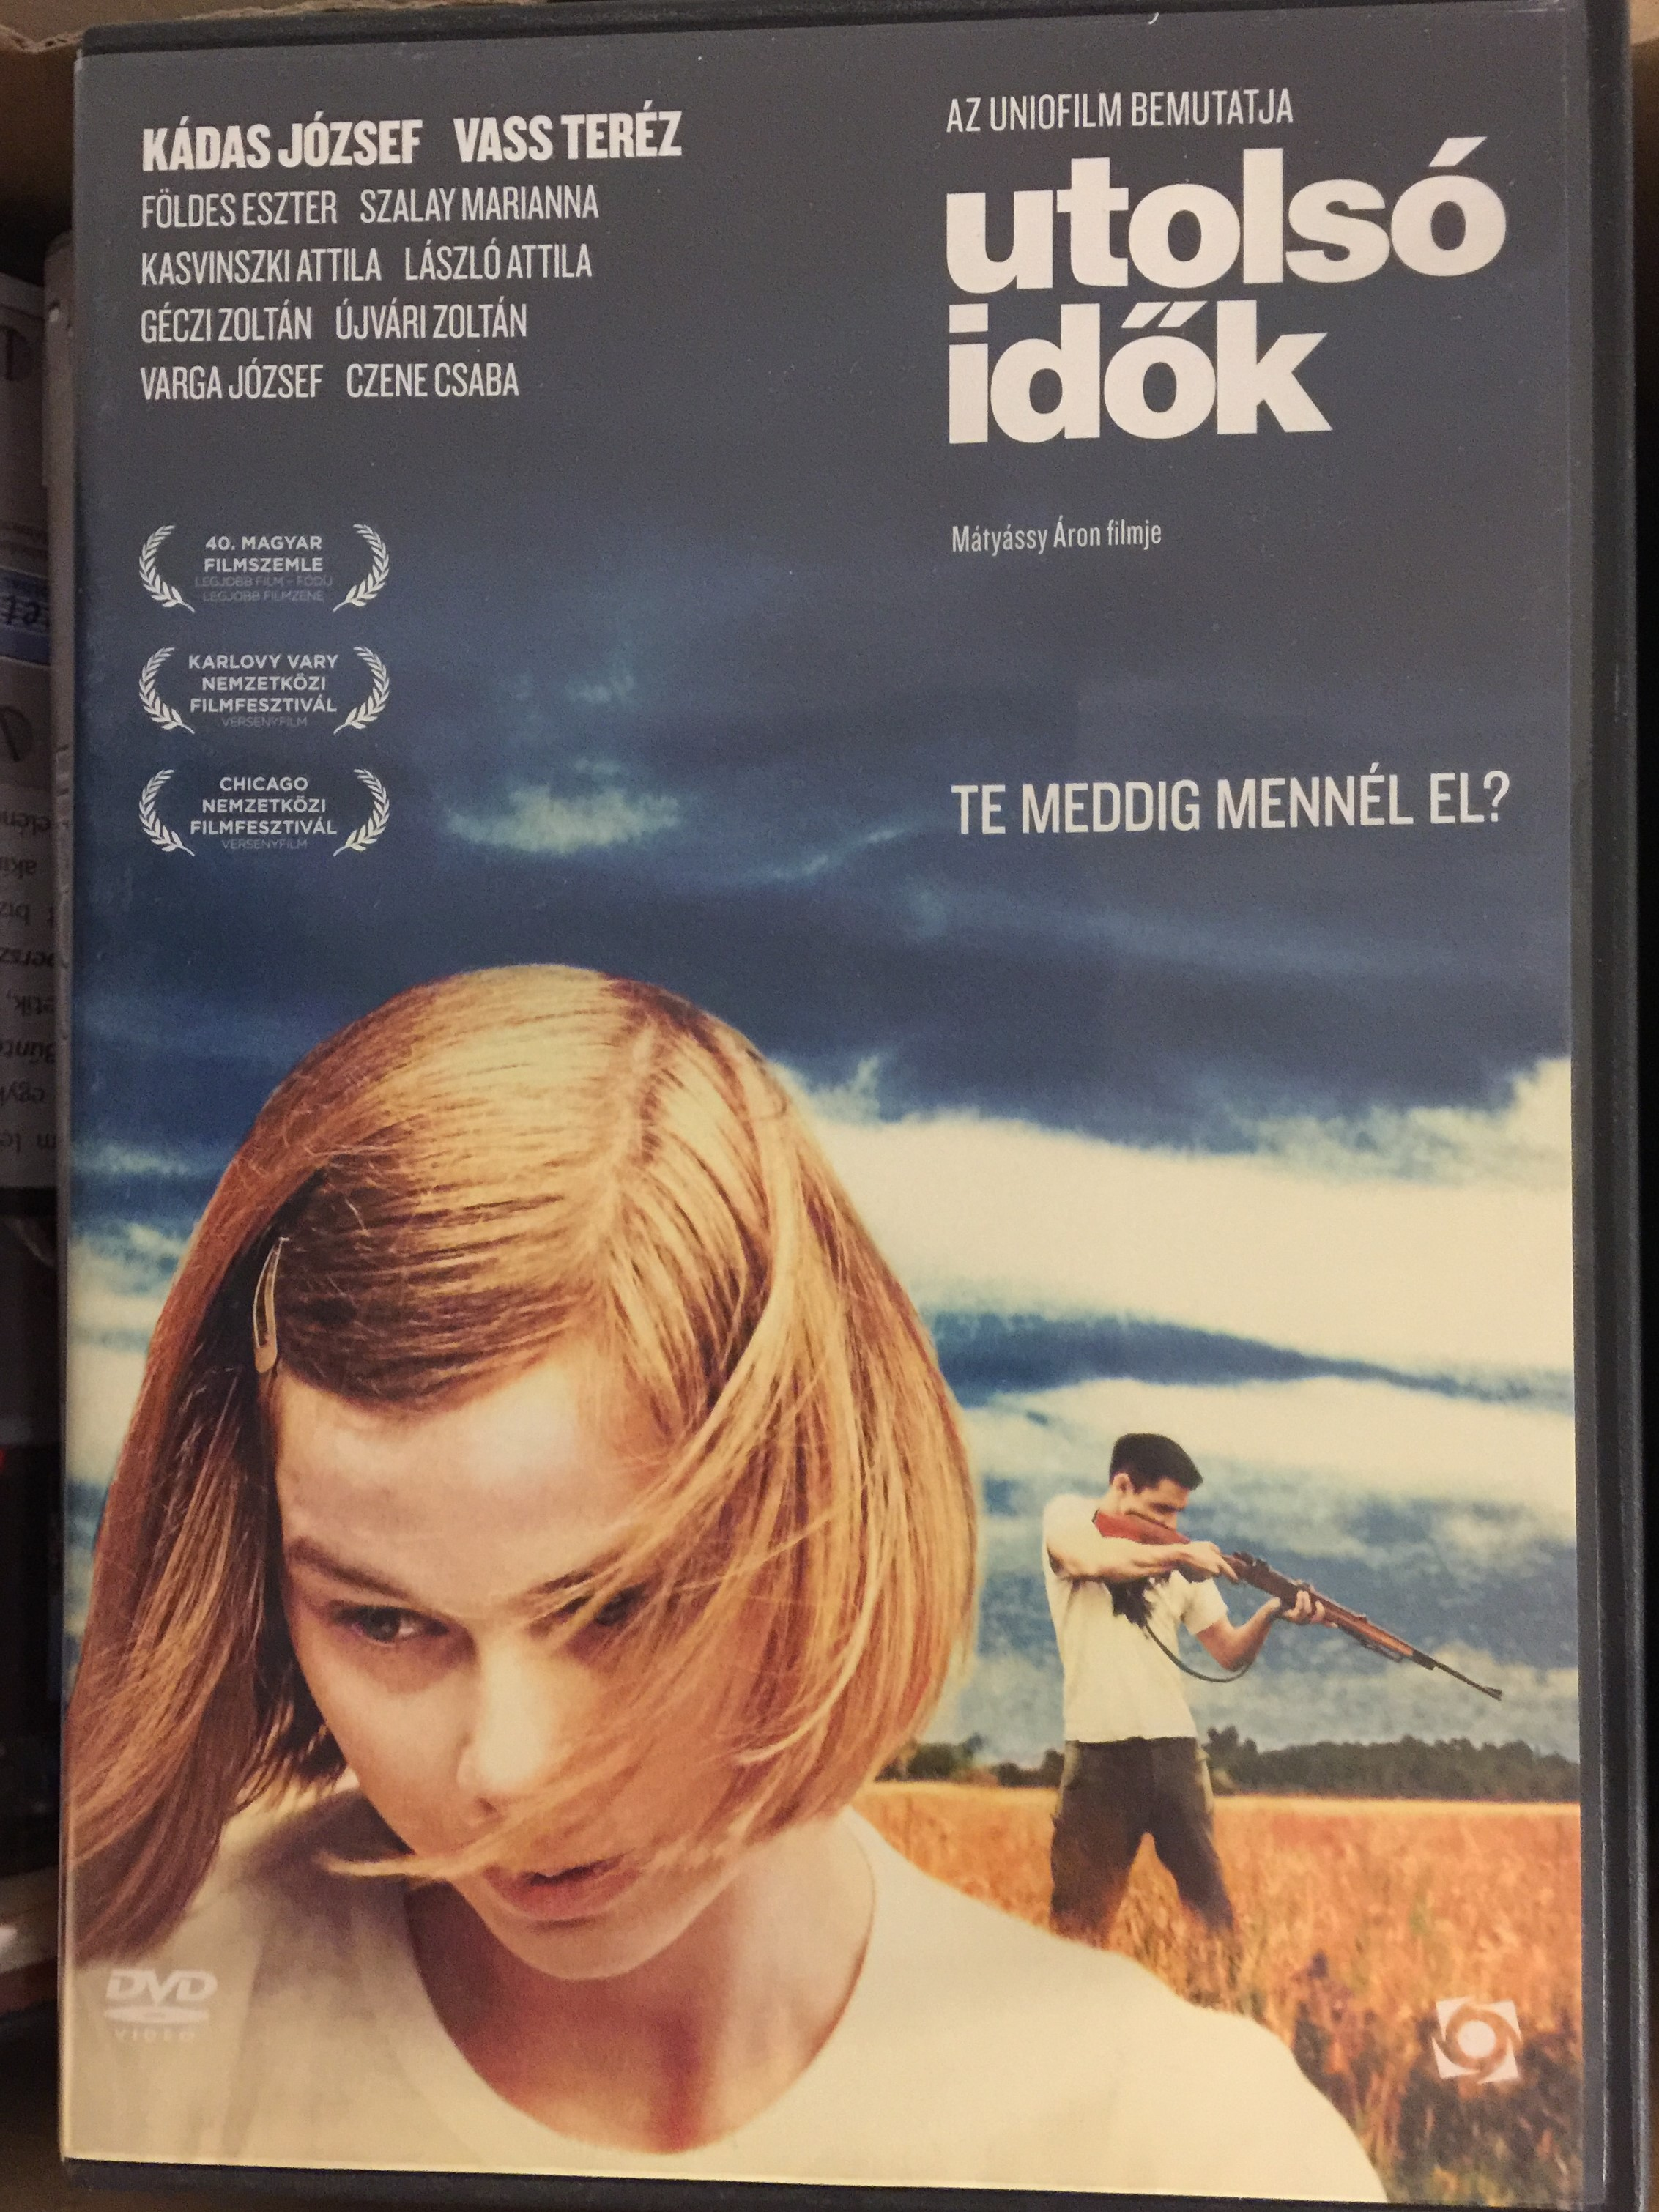 utols-id-k-dvd-2009-end-times-1.jpg